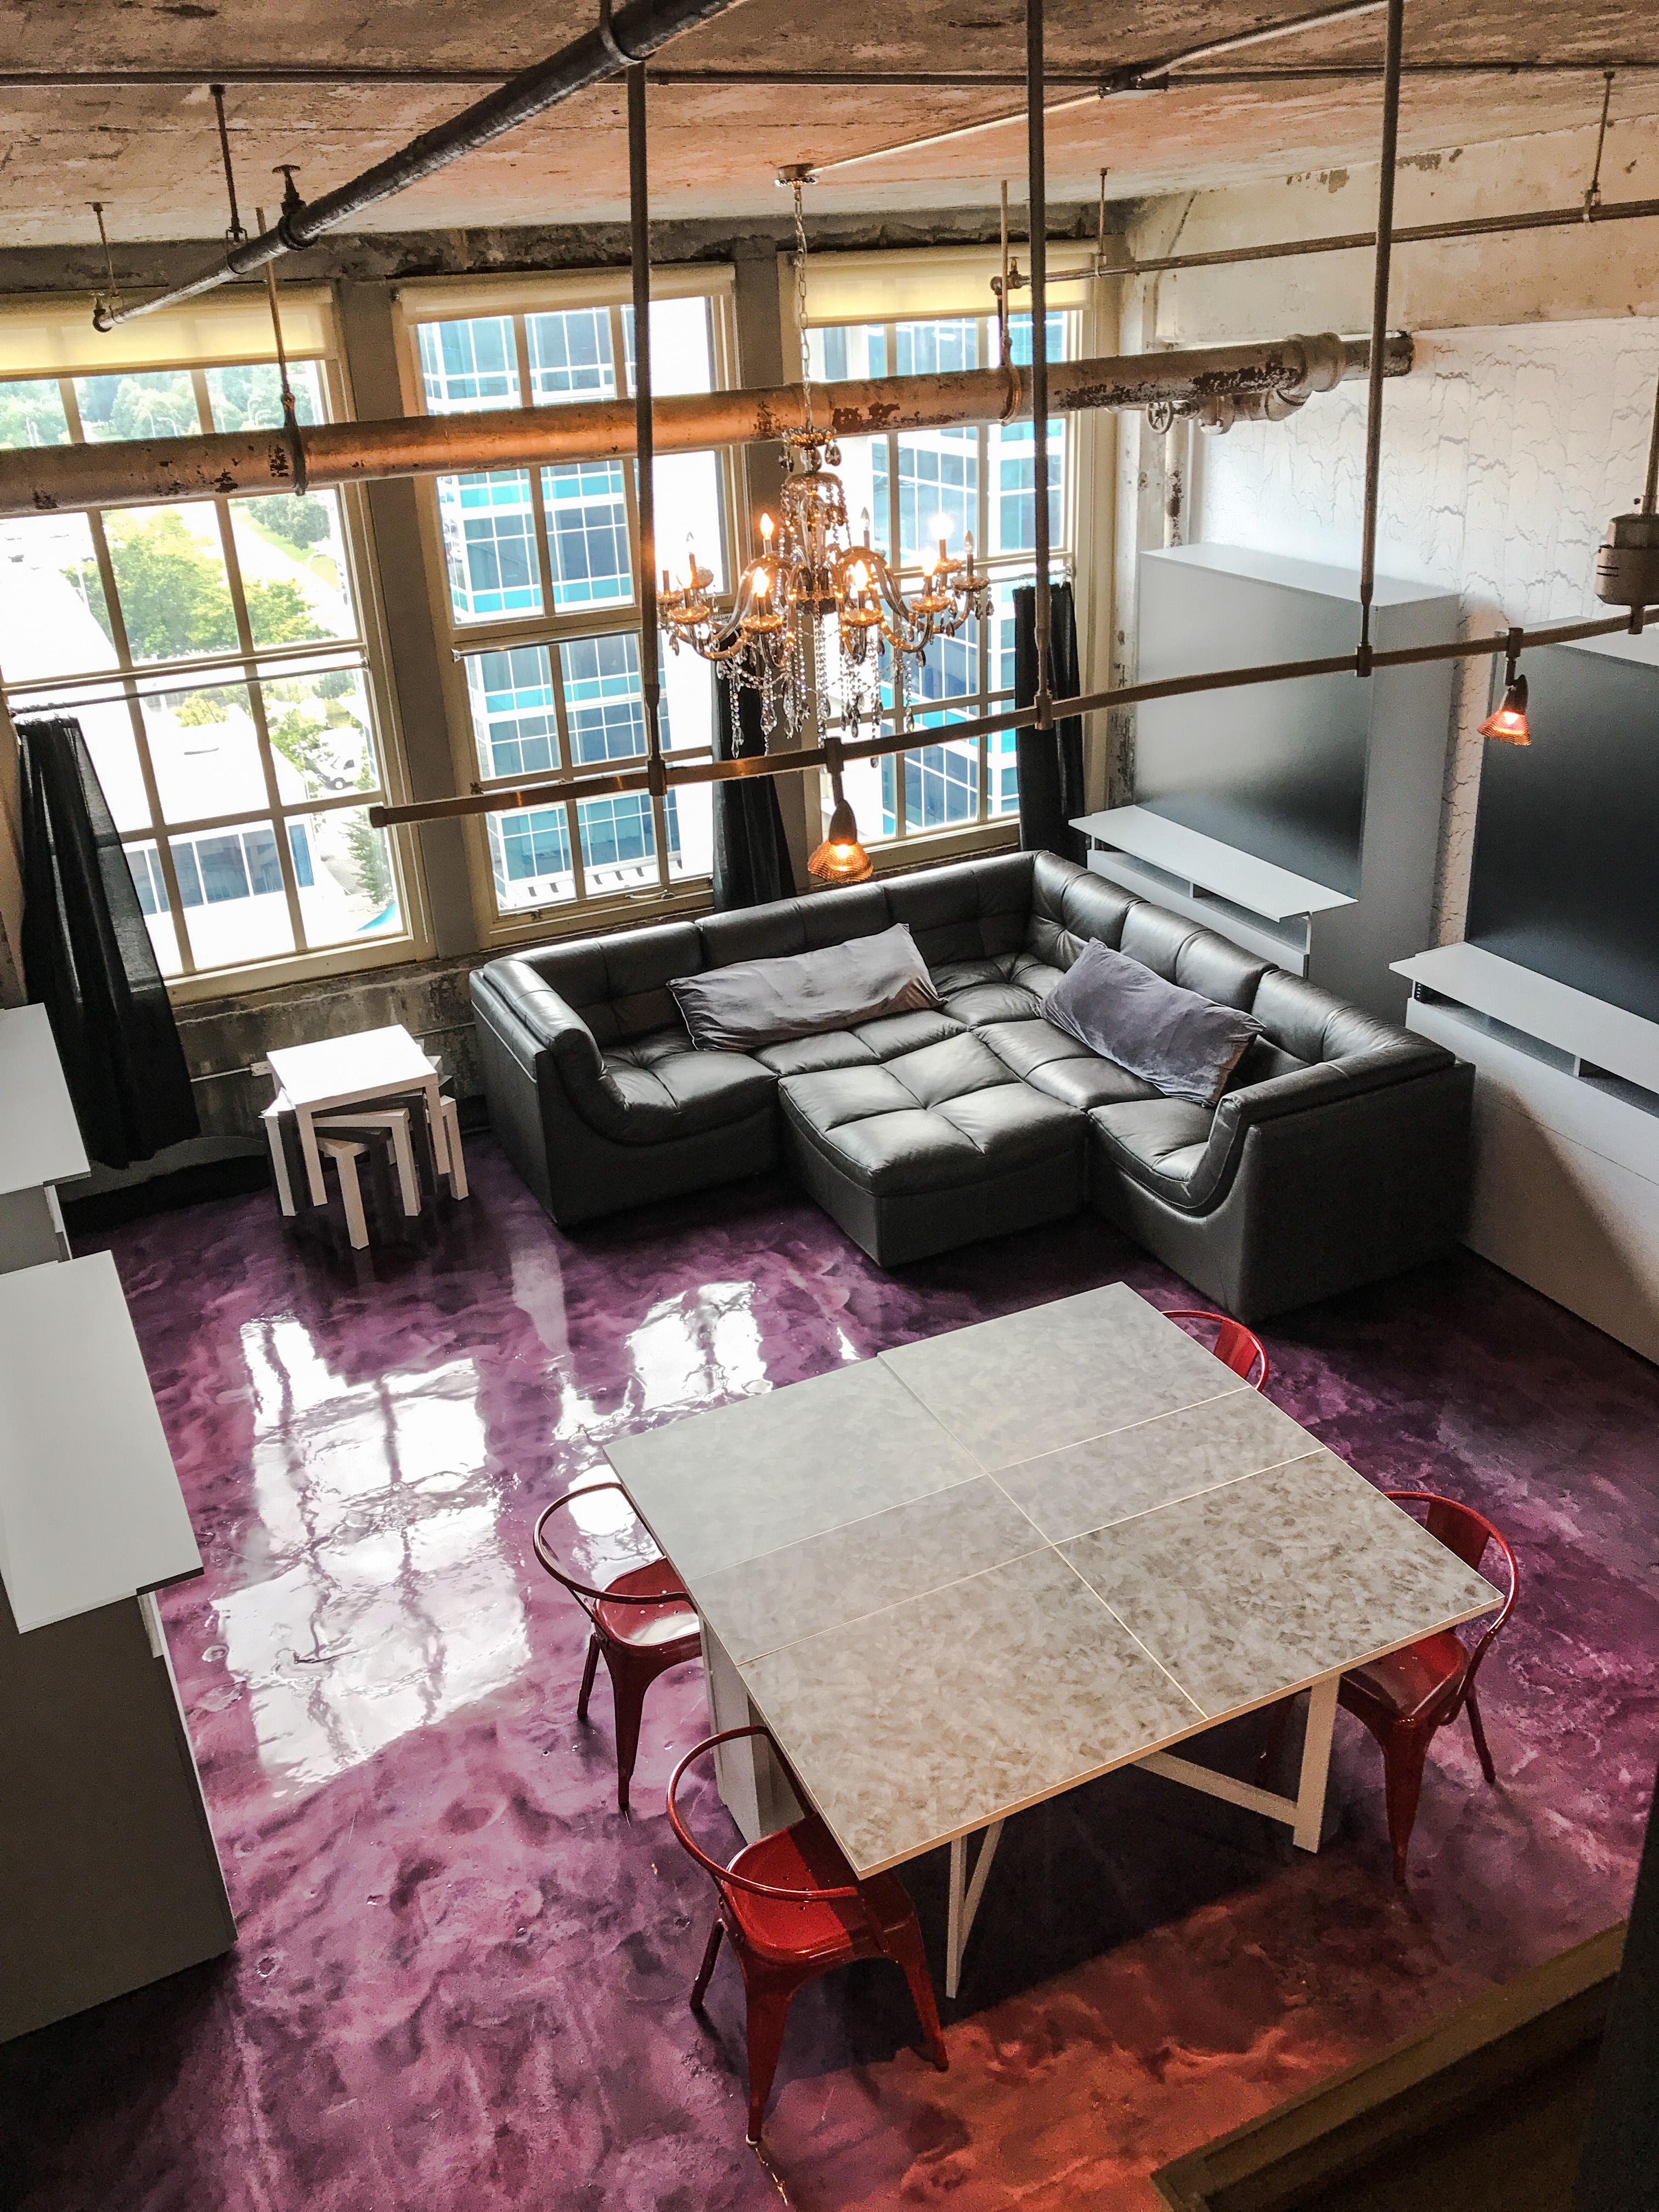 Loft Reverie 811 - Birdseye + Views + City Scape + Downtown Louisville + Kentucky + Dining + Cloud S